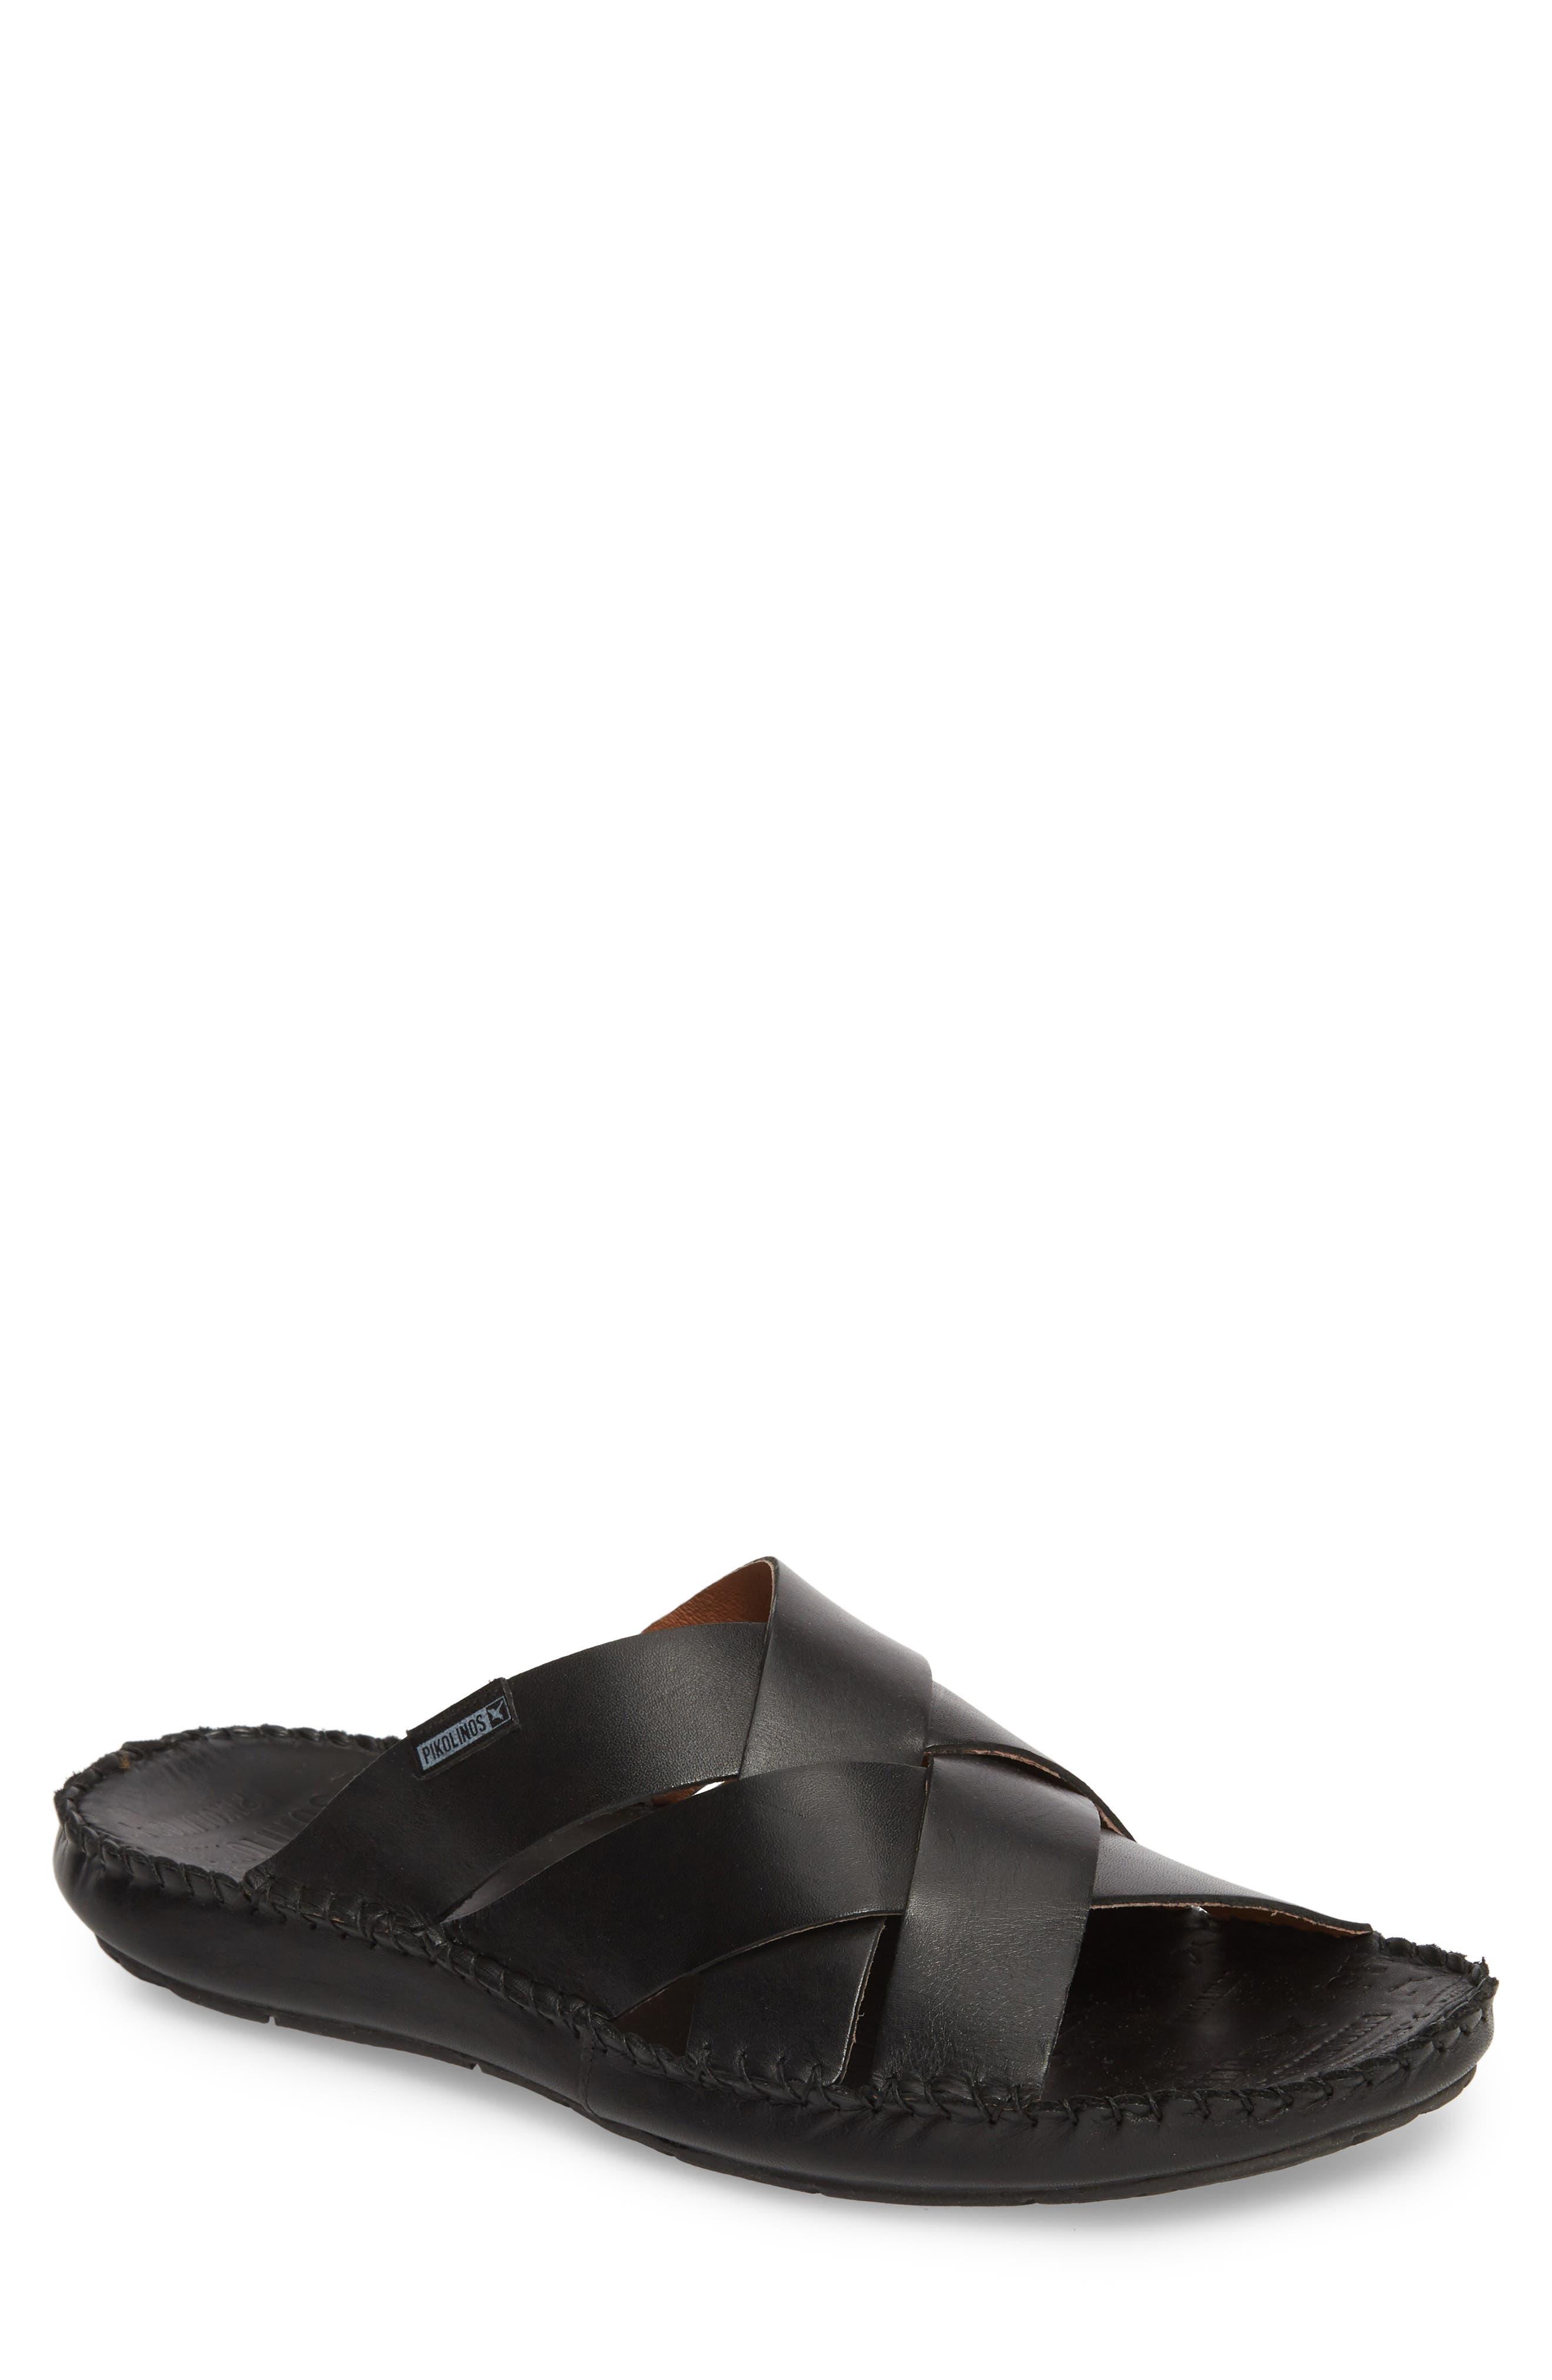 'Tarifa' Slide Sandal,                         Main,                         color, 001